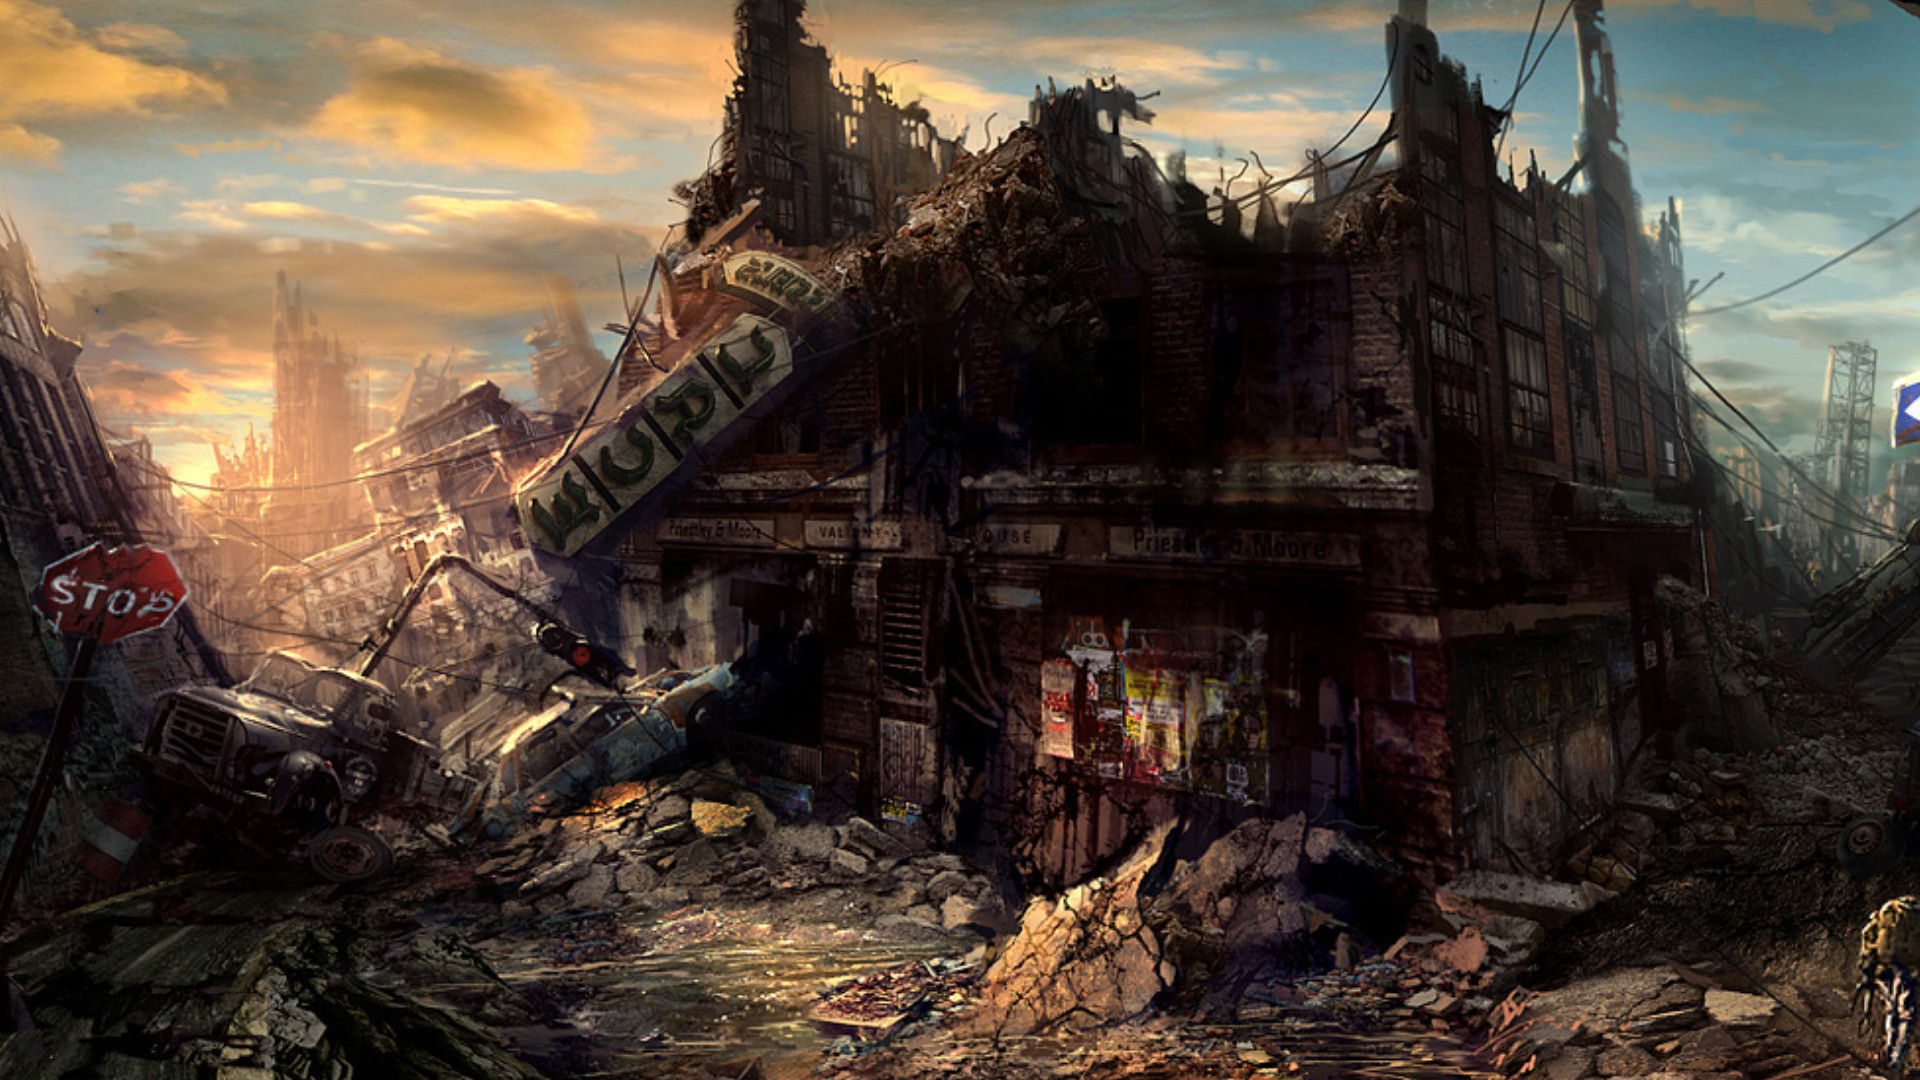 Sci Fi – Post Apocalyptic Wallpaper | Post-Apocalyptia | Pinterest | Post  apocalyptic, Sci fi and Wallpaper